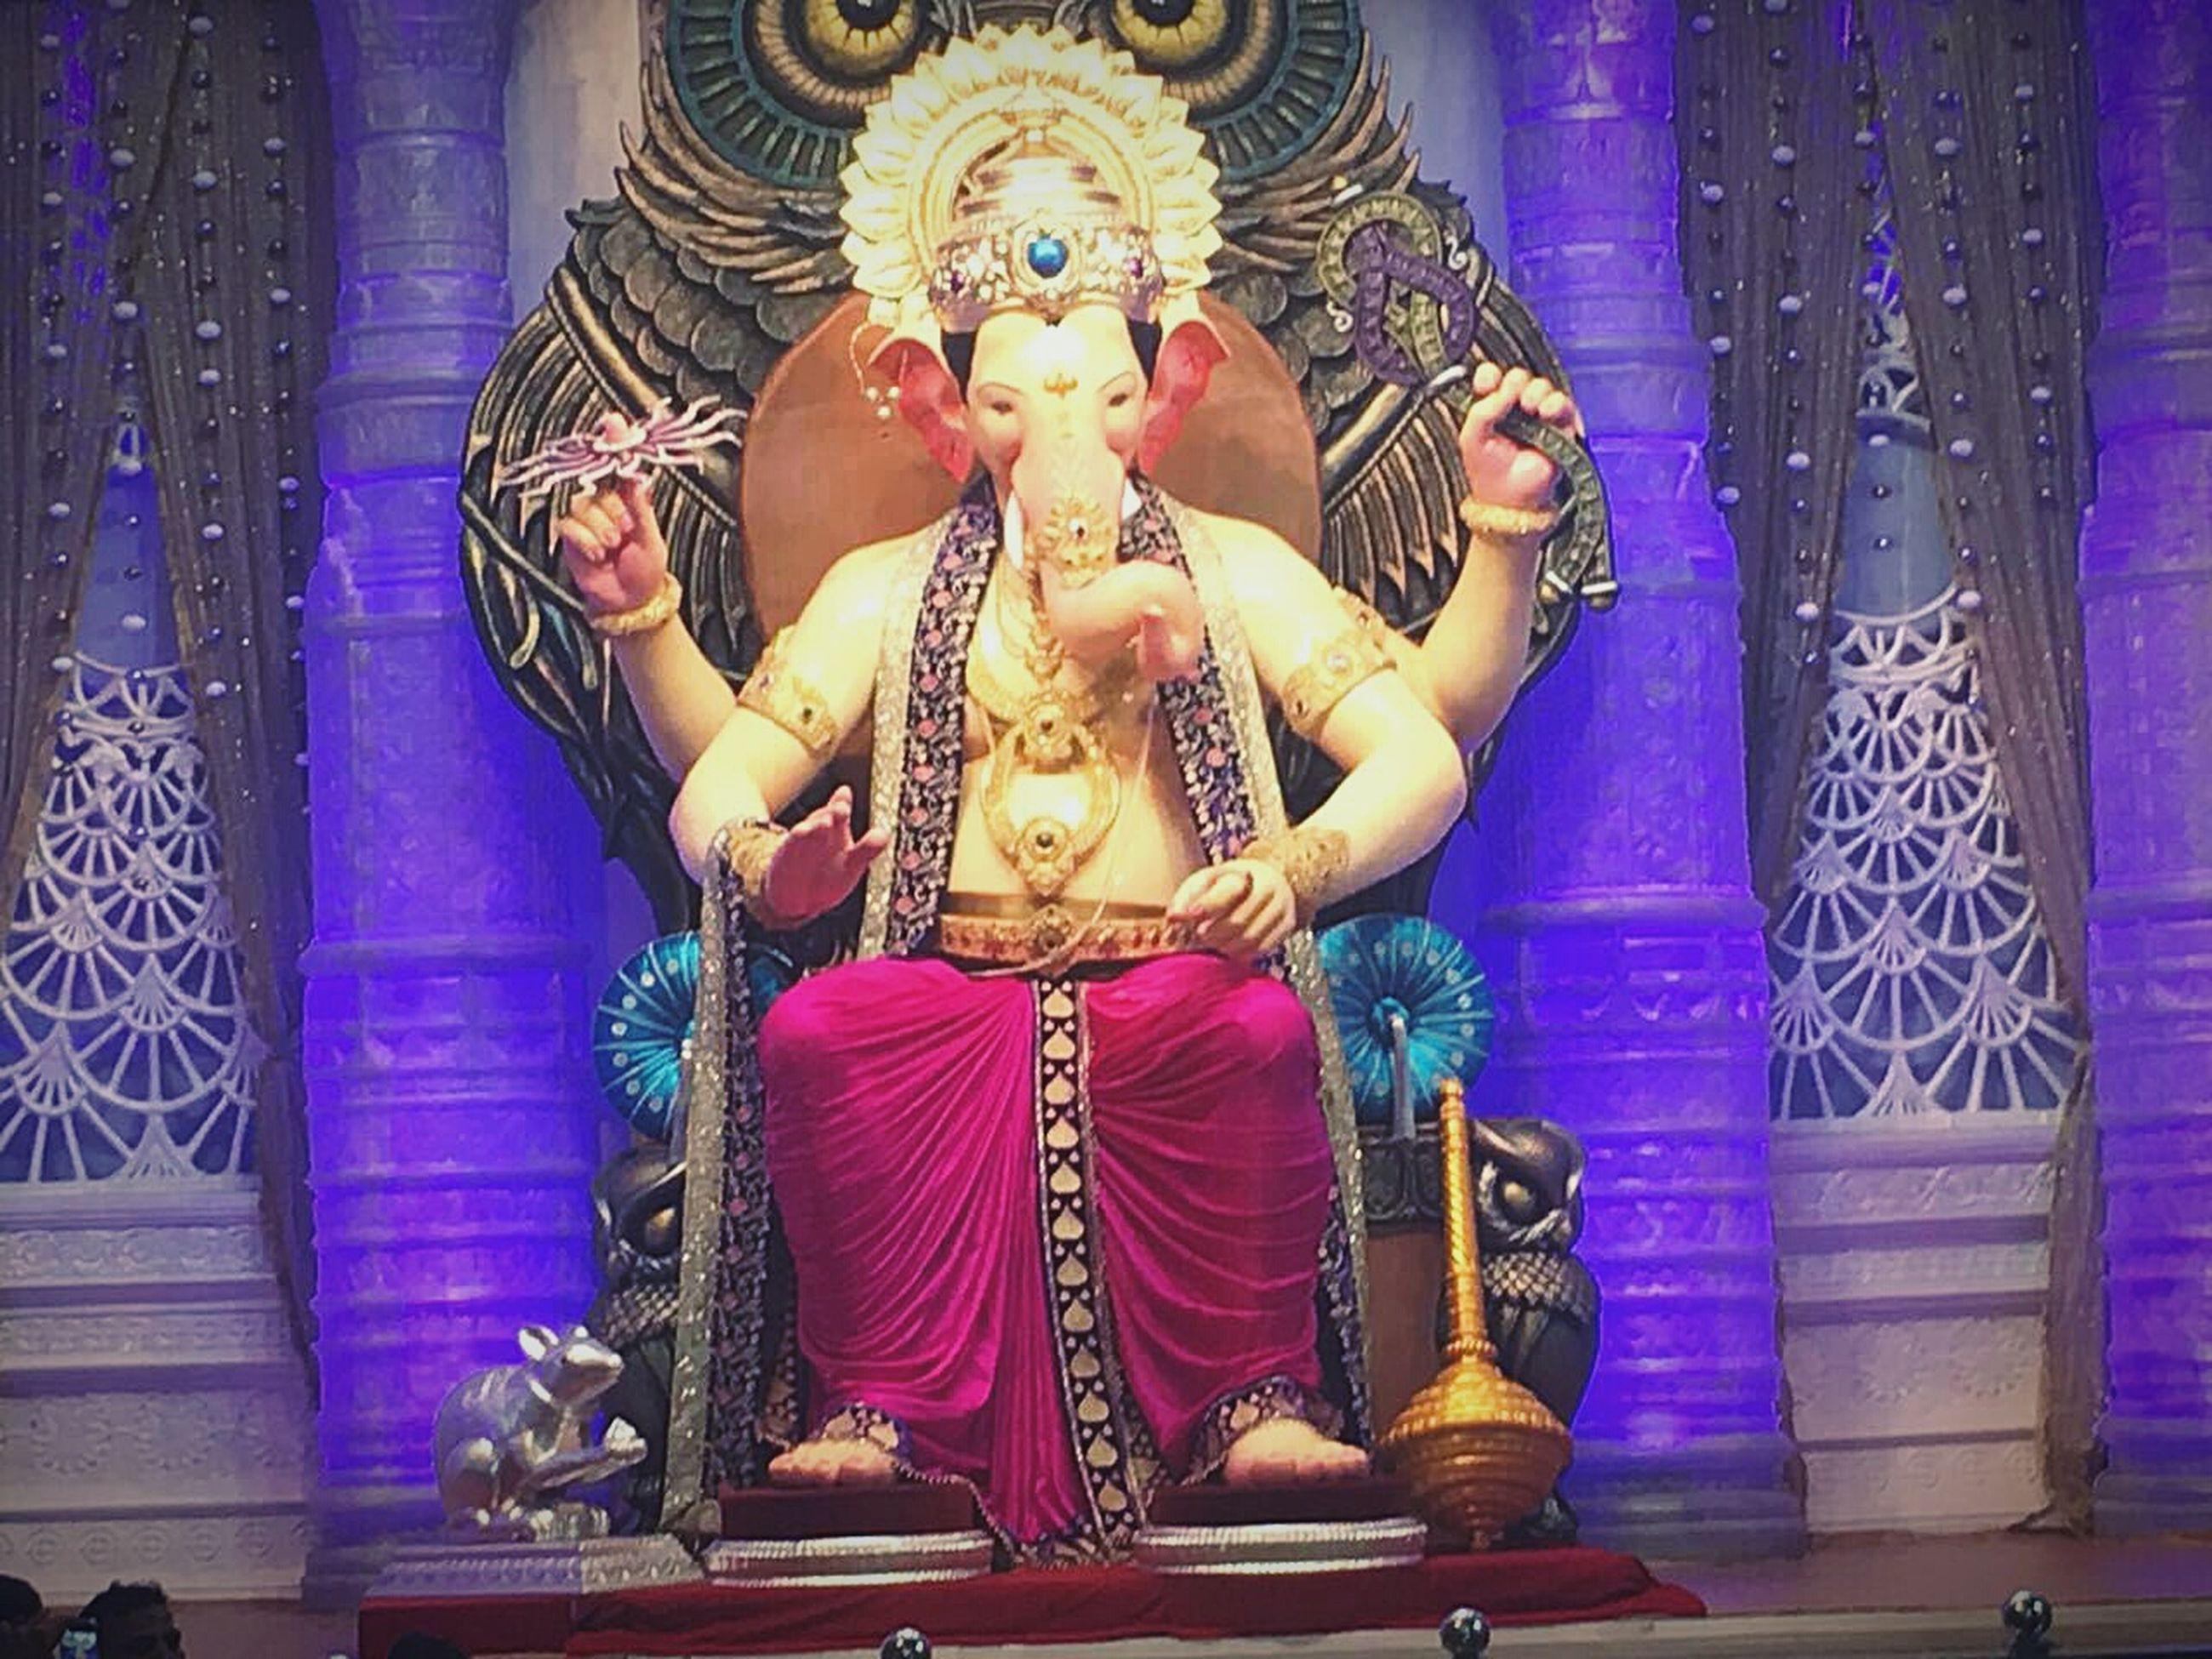 human representation, art and craft, statue, spirituality, religion, indoors, place of worship, idol, creativity